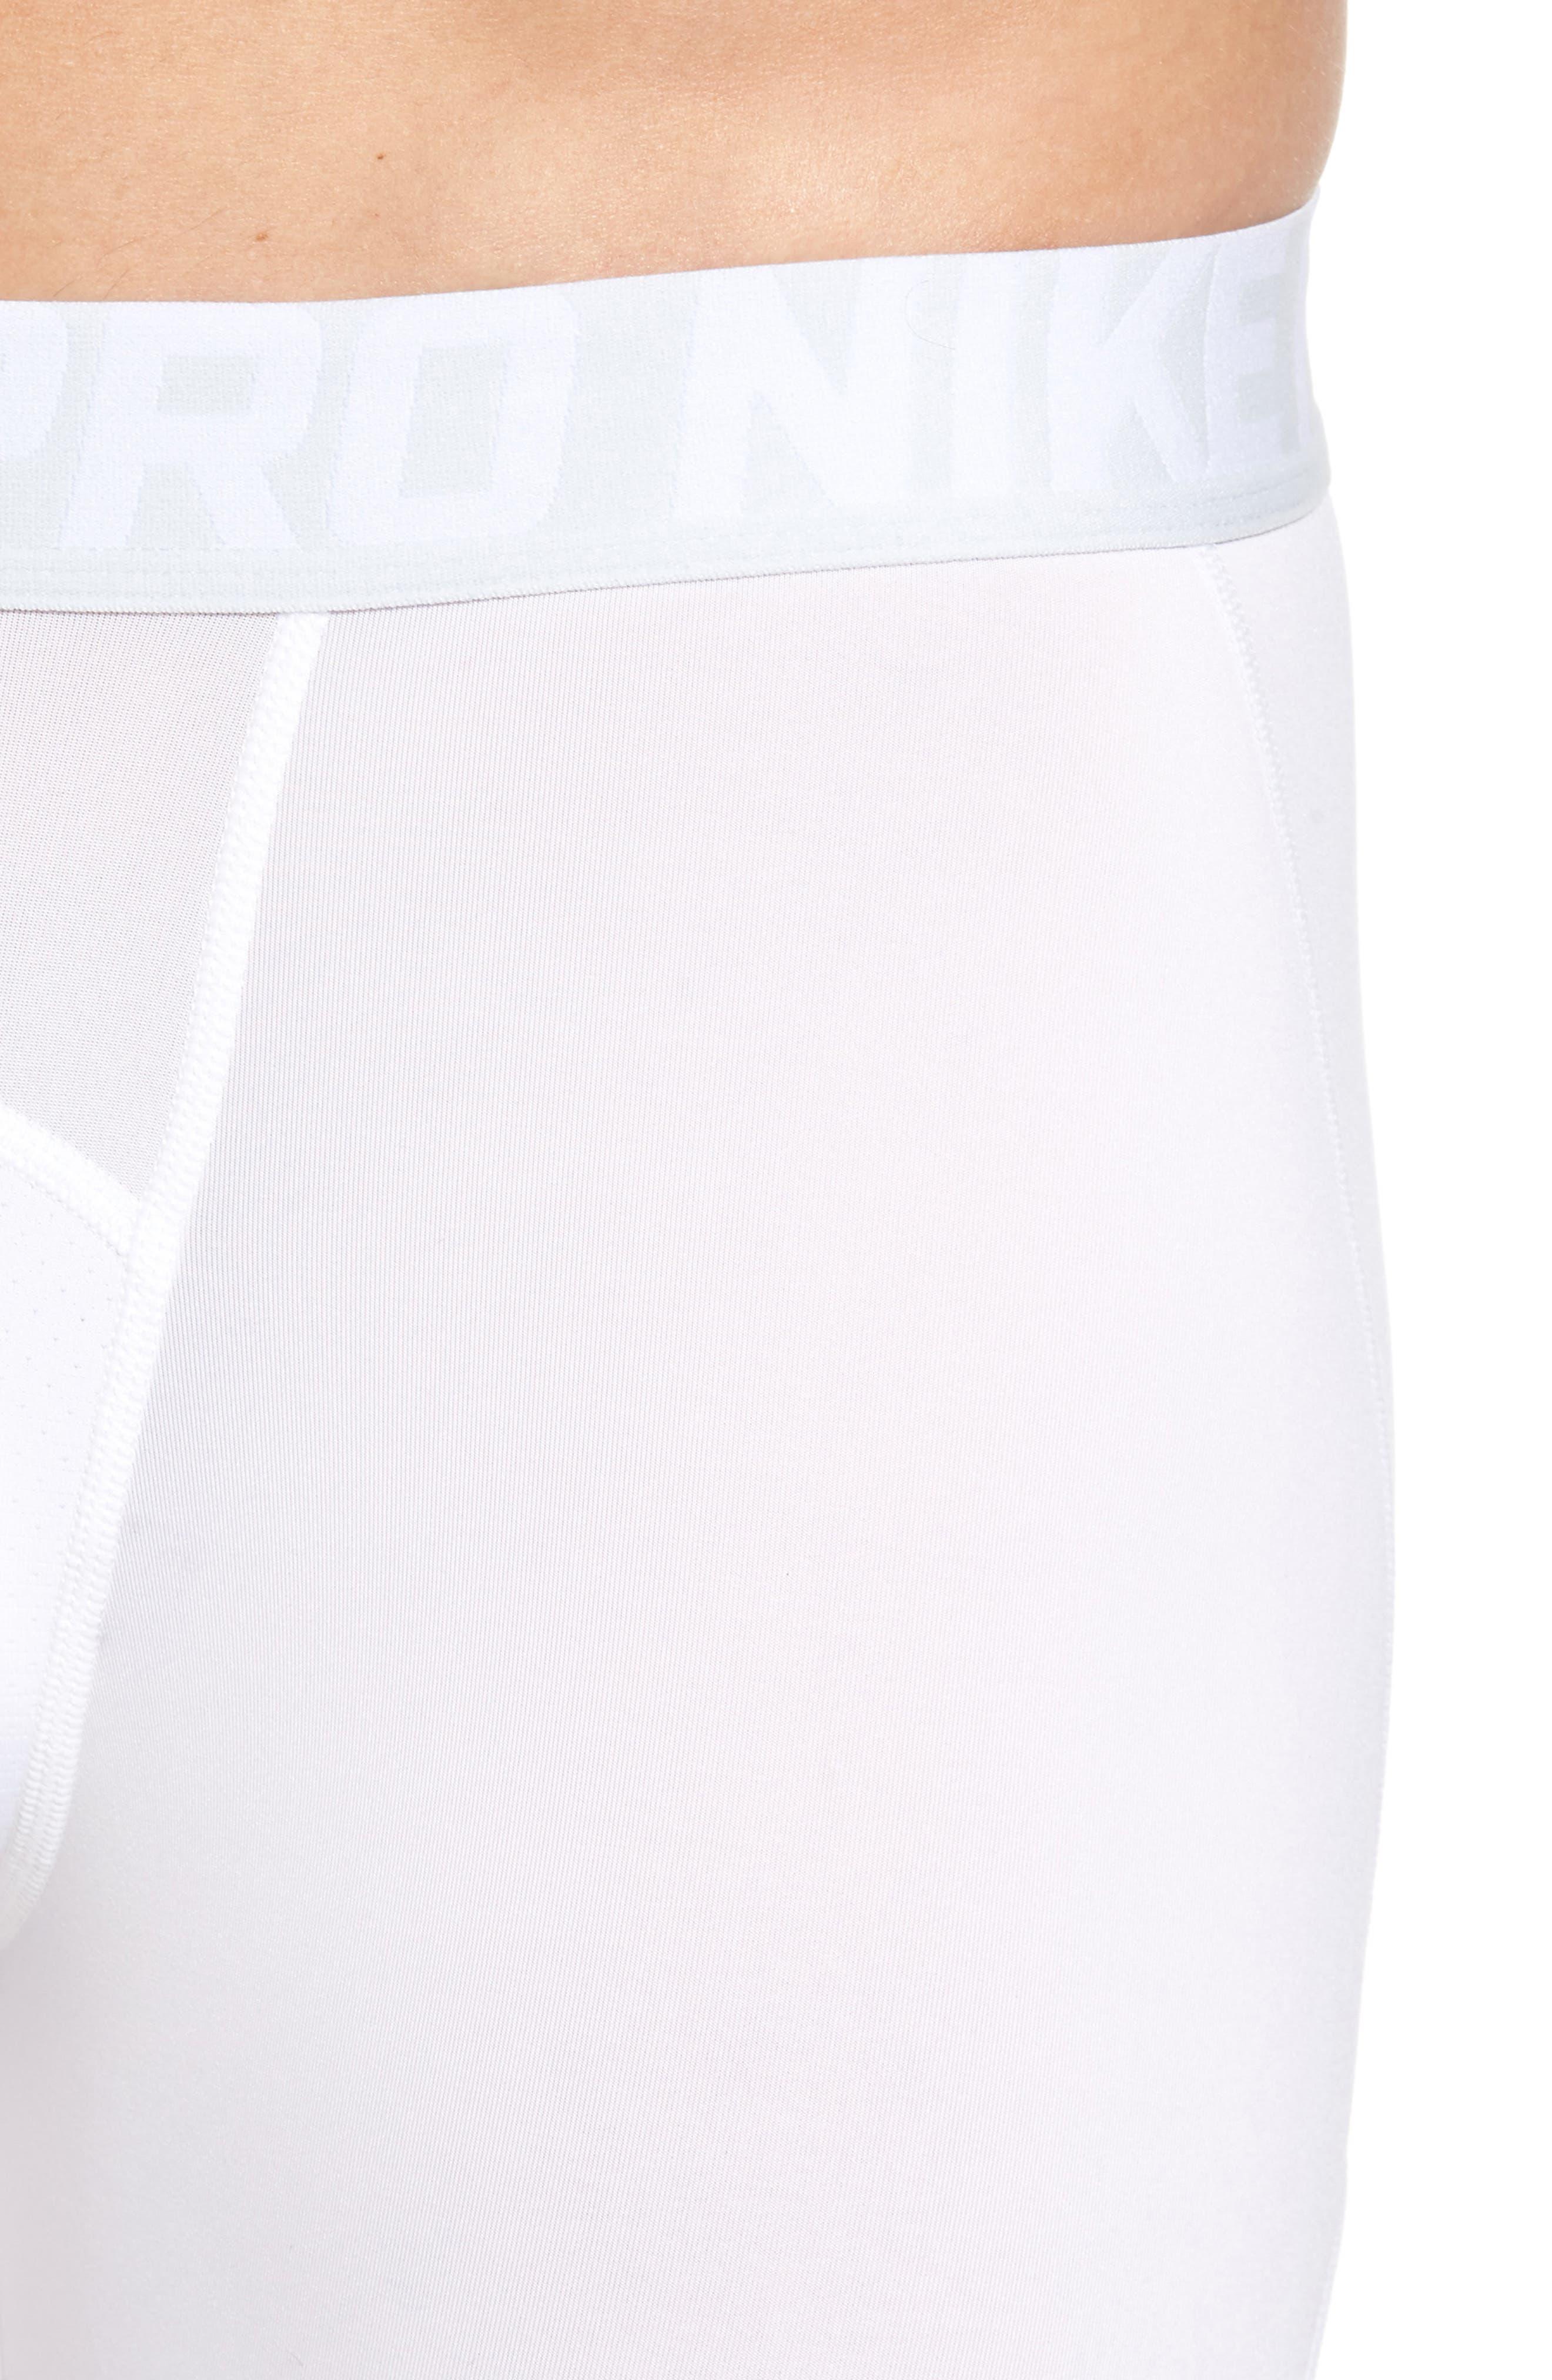 Pro Compression Shorts,                             Alternate thumbnail 12, color,